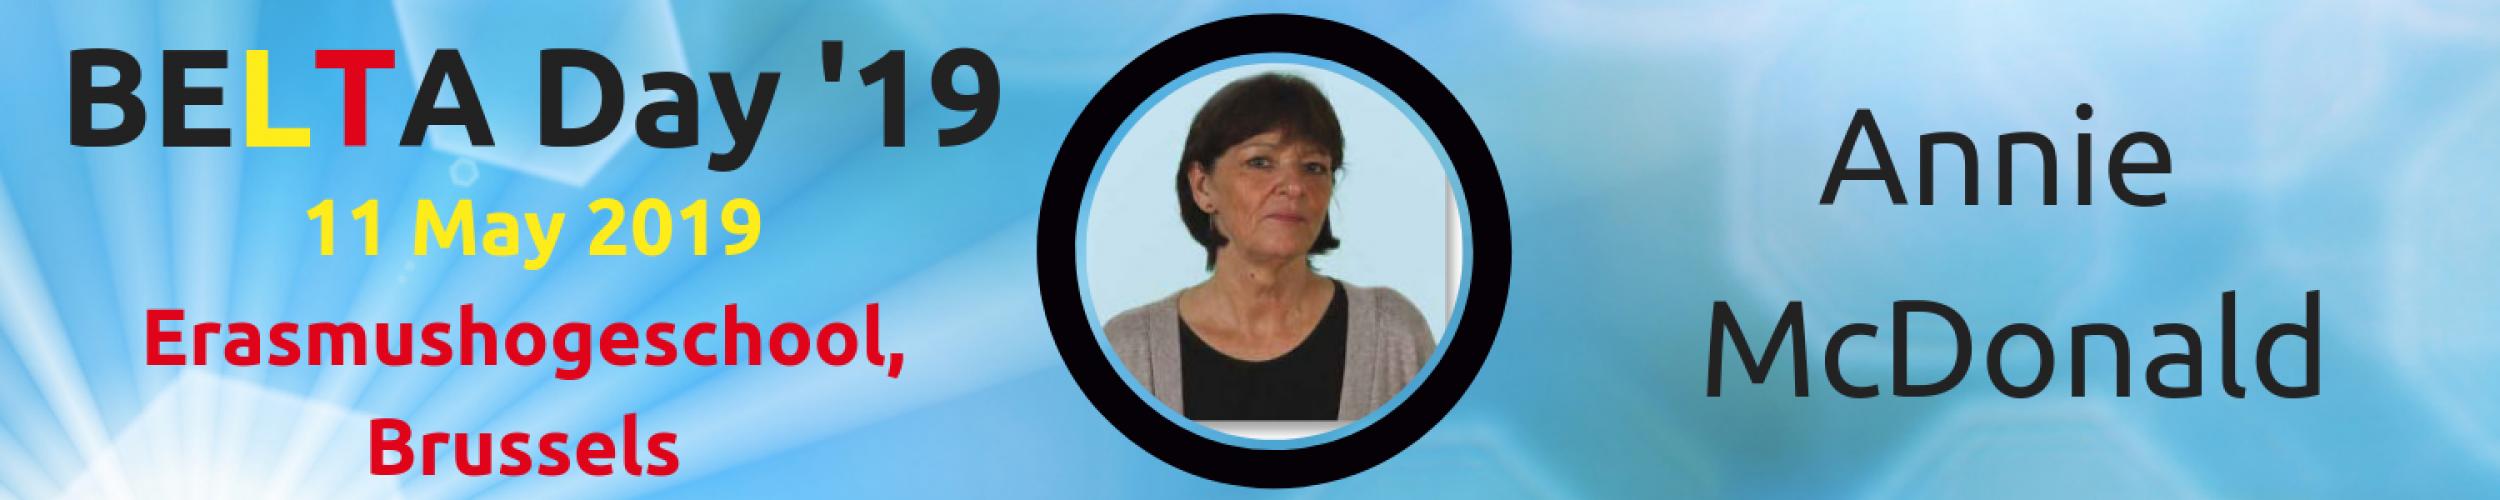 BELTA Day '19: Meet the Speakers: Annie McDonald